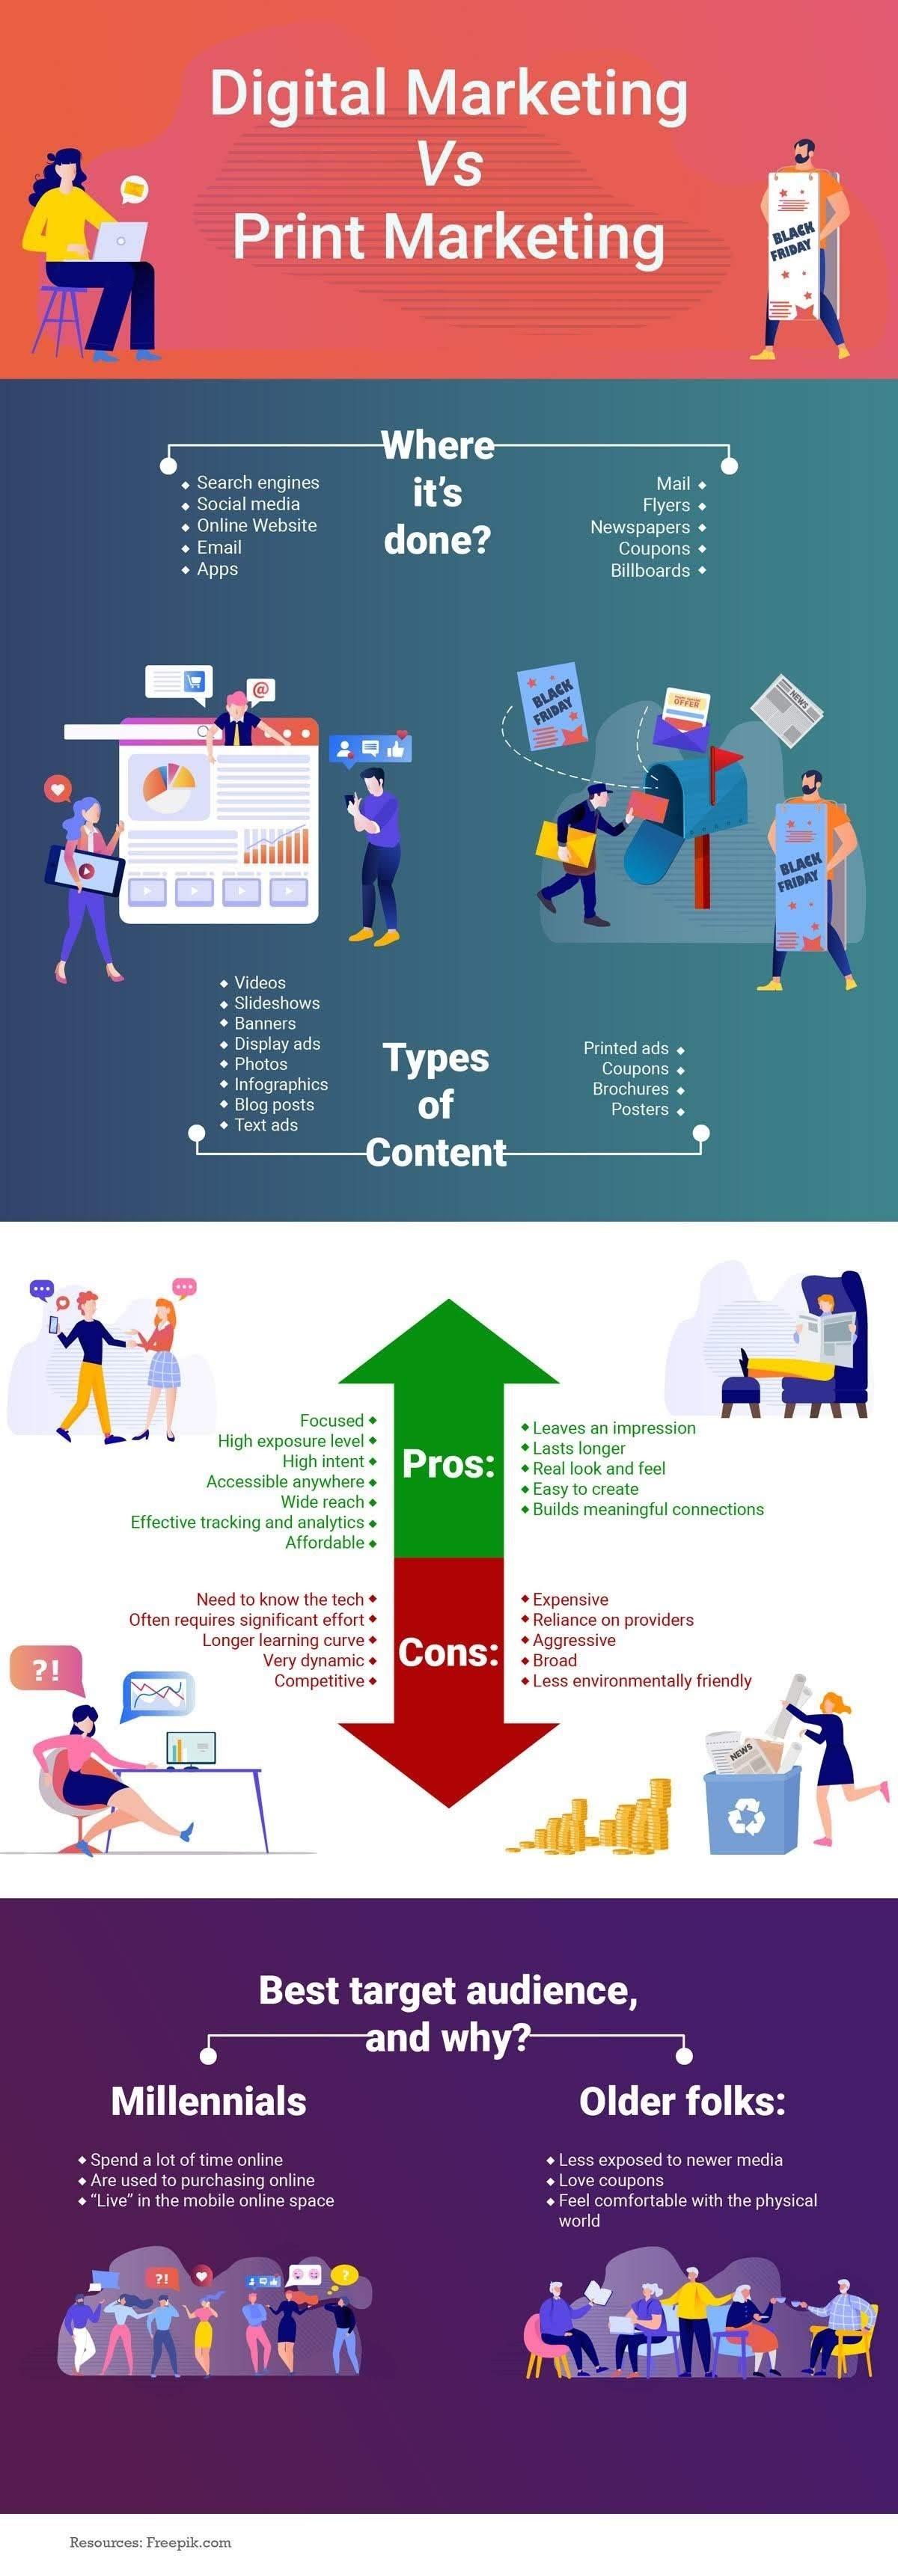 Digital Marketing vs Print Marketing #infographic